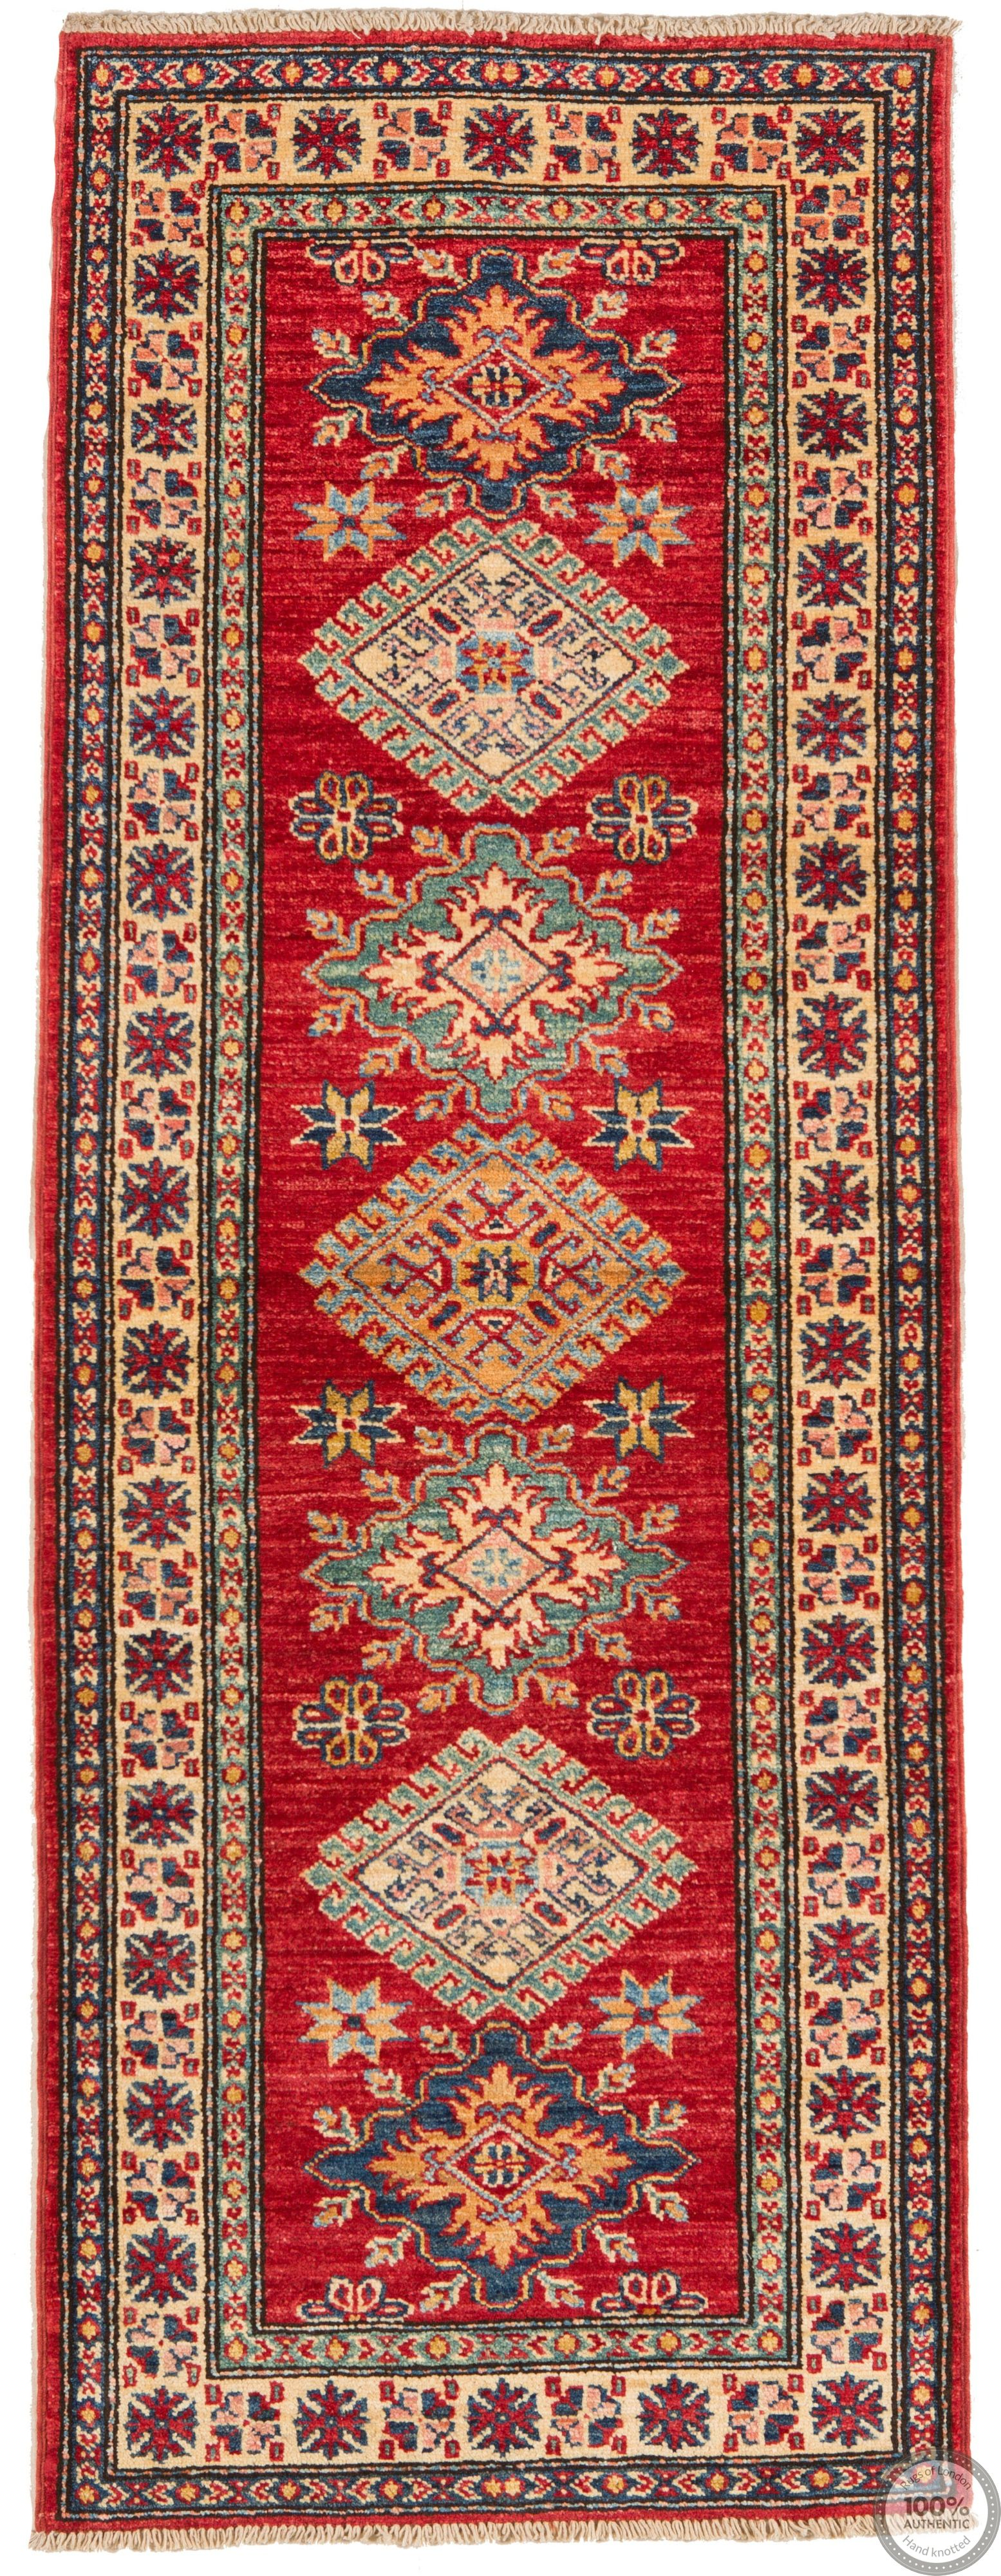 Red Caucasian / Kazak Design Runner Rug - 5'77 x 2'1